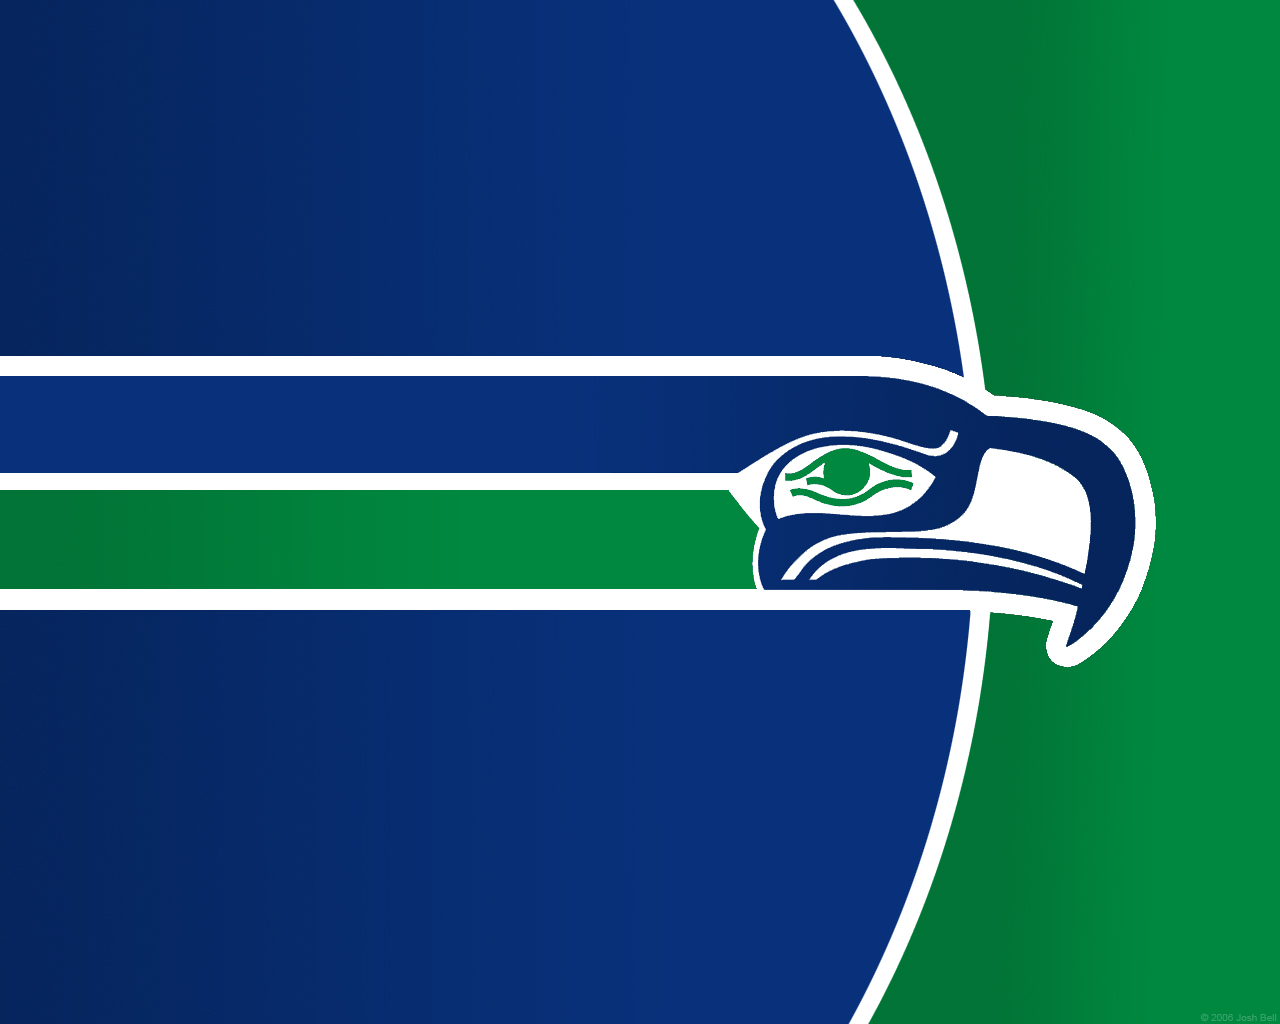 Seattle Seahawks Computer Wallpapers Desktop Backgrounds 1280x1024 1280x1024